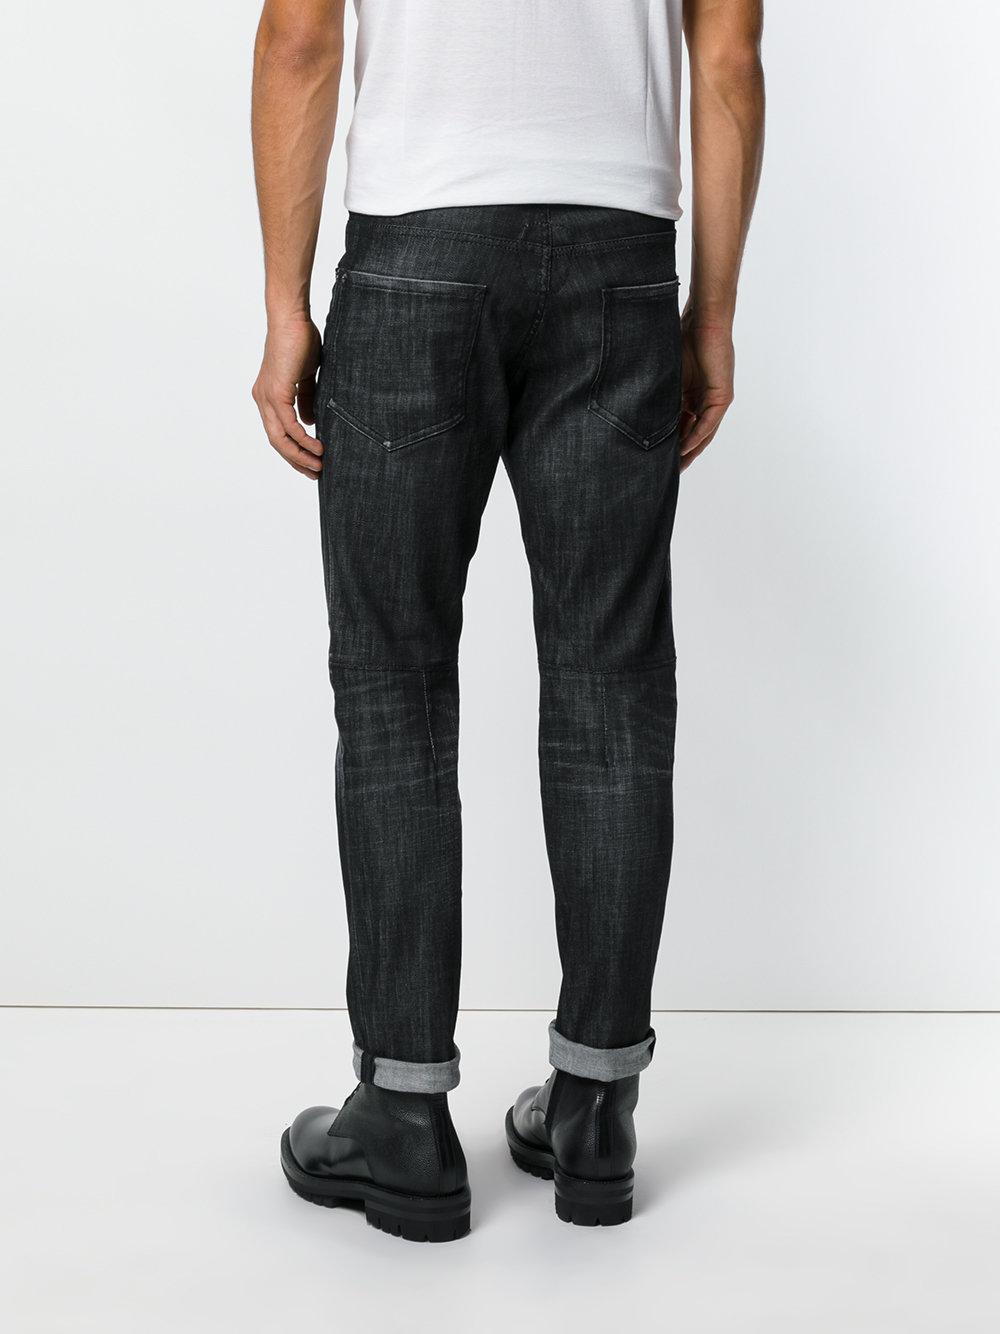 DSquared² Denim City Biker Jeans in Blue for Men